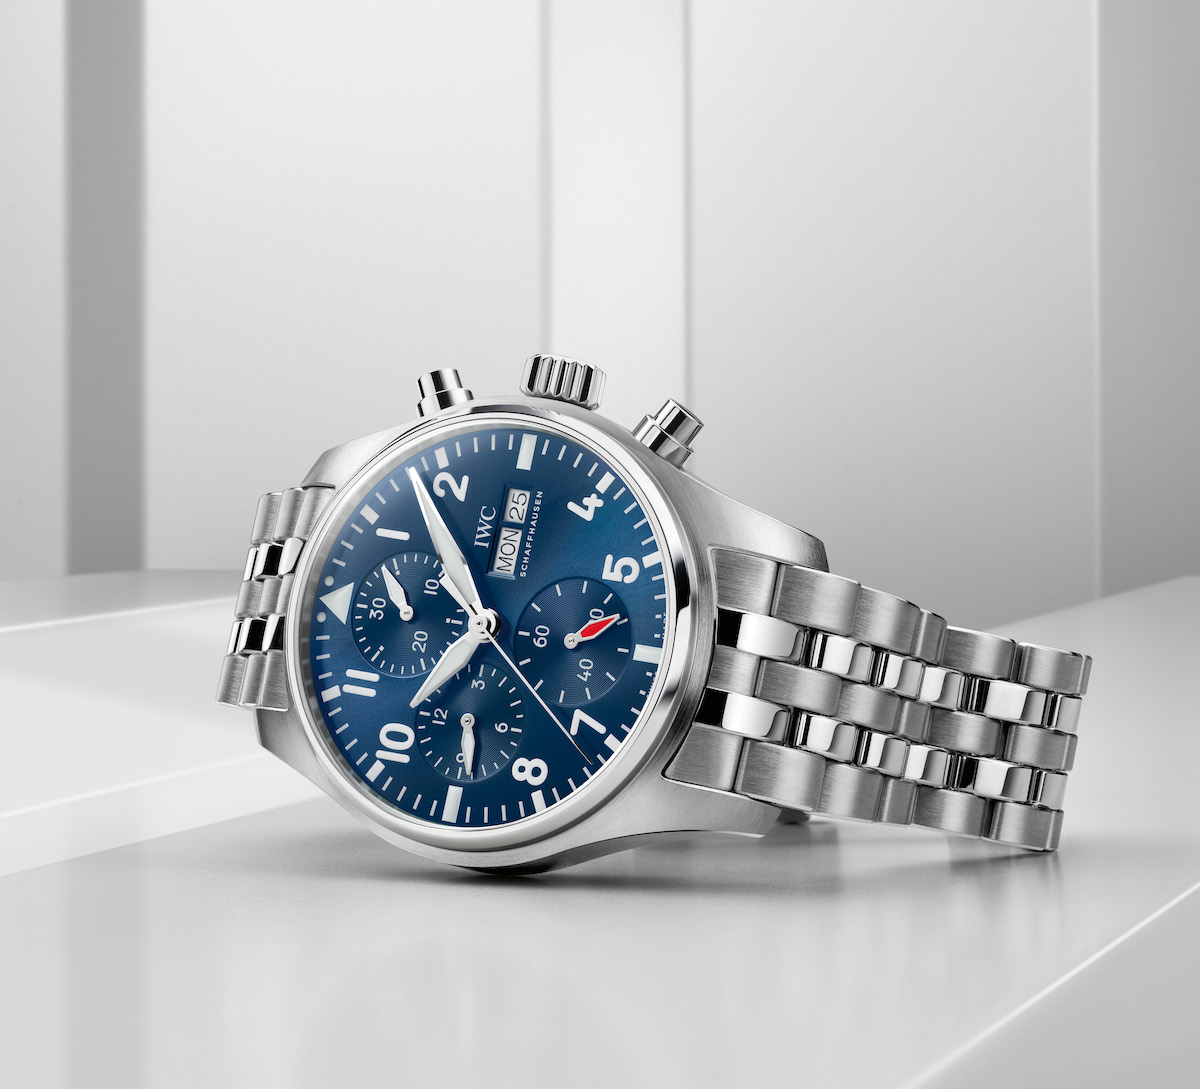 watches & wonders 2021, iwc